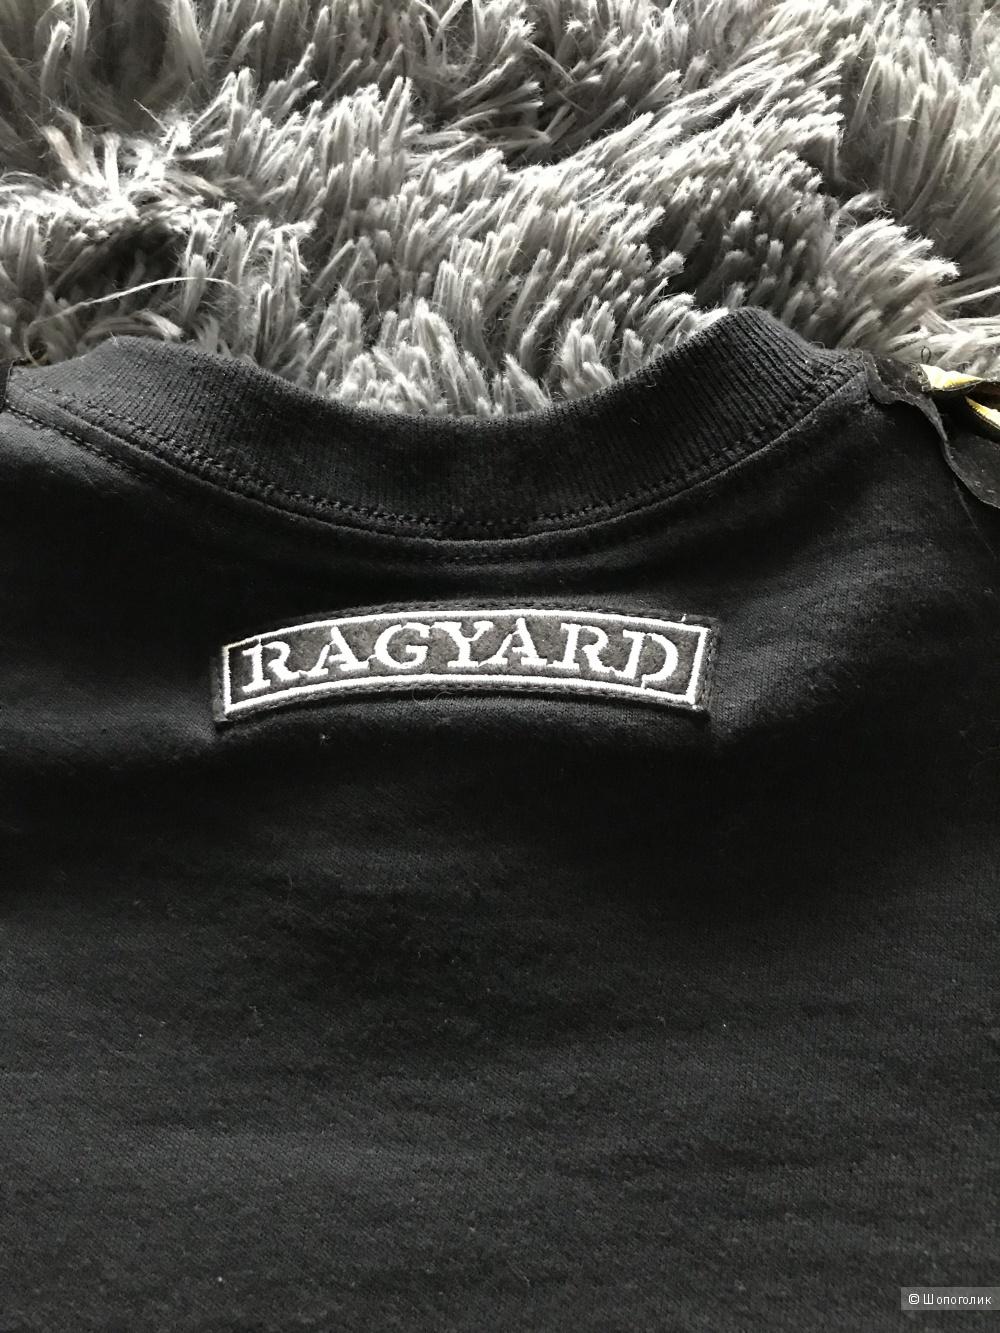 Футболка RAGYARD размер S - 40-44 рус